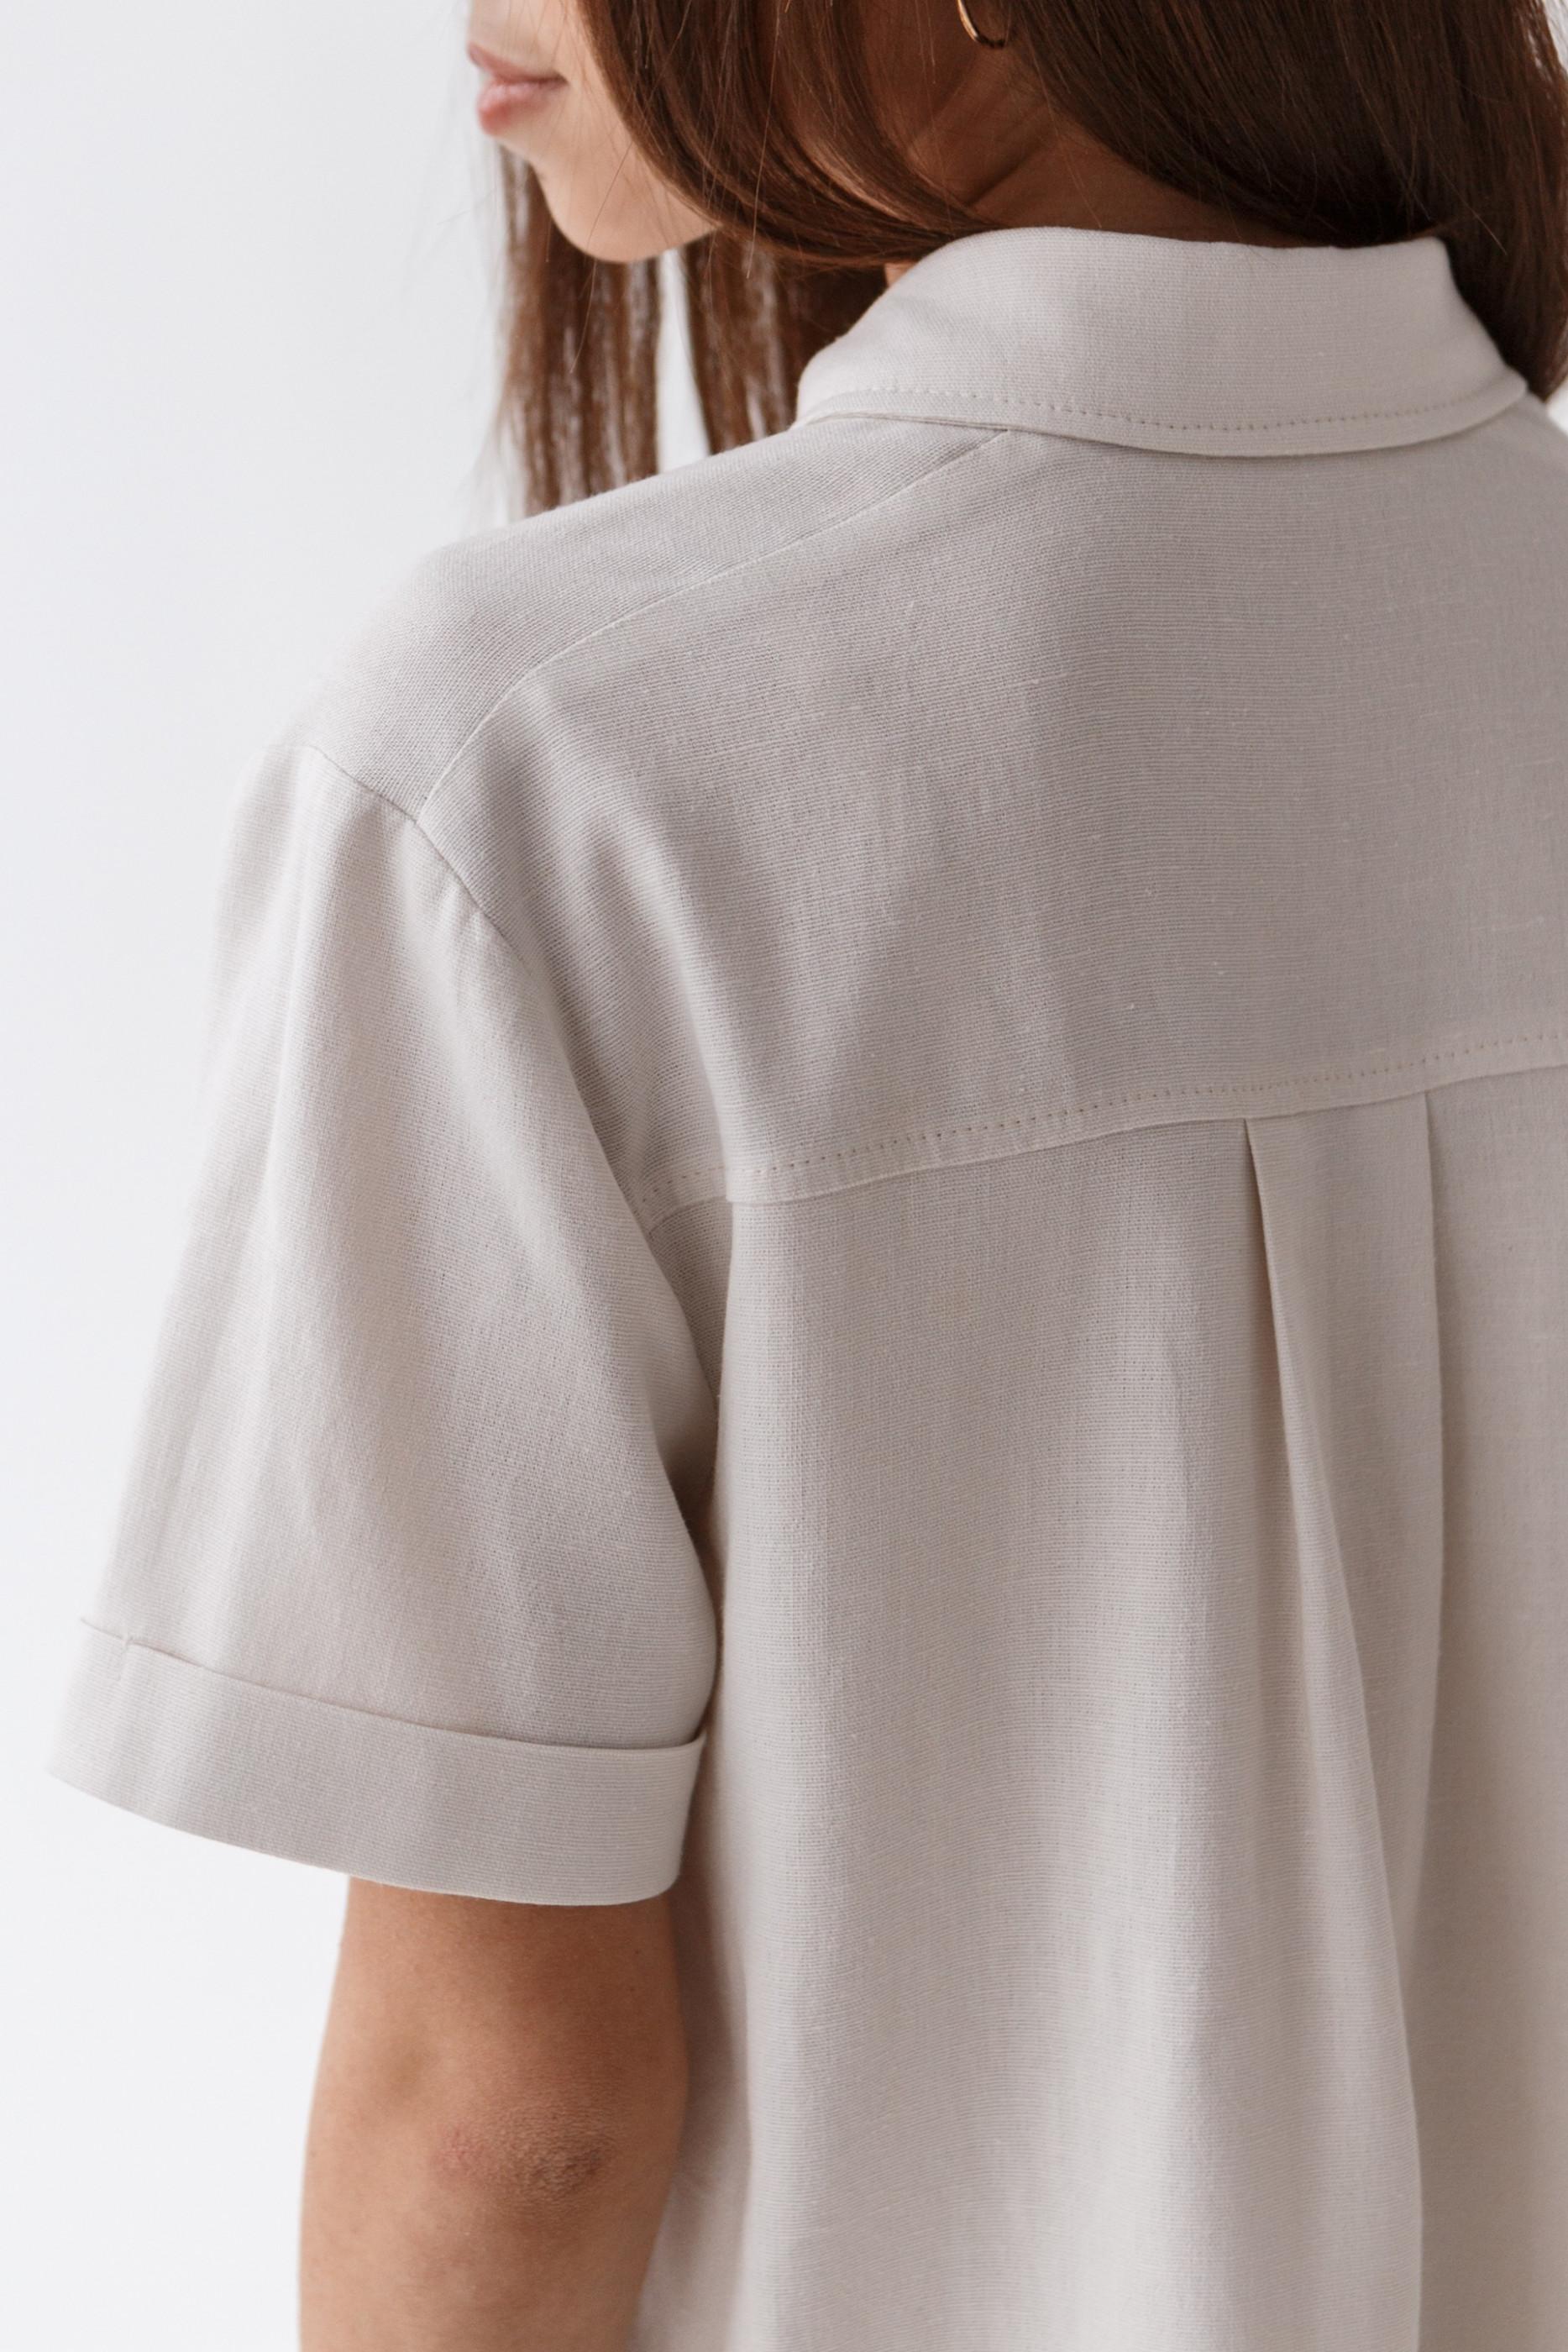 Сорочка Ясміна, фото №3